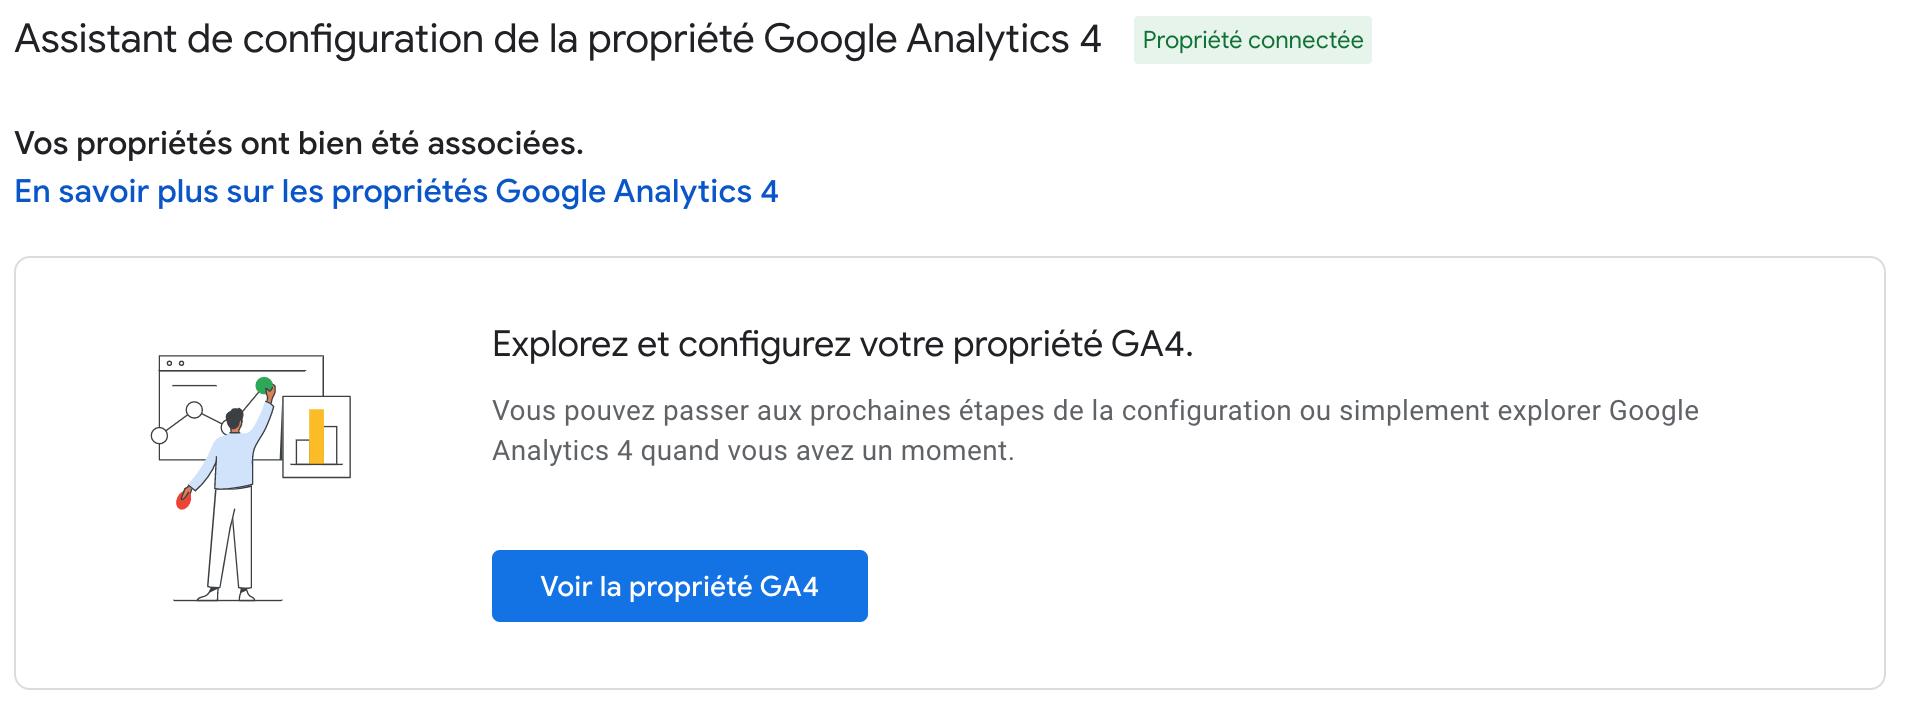 Aide au paramétrage de Google Analytics 4